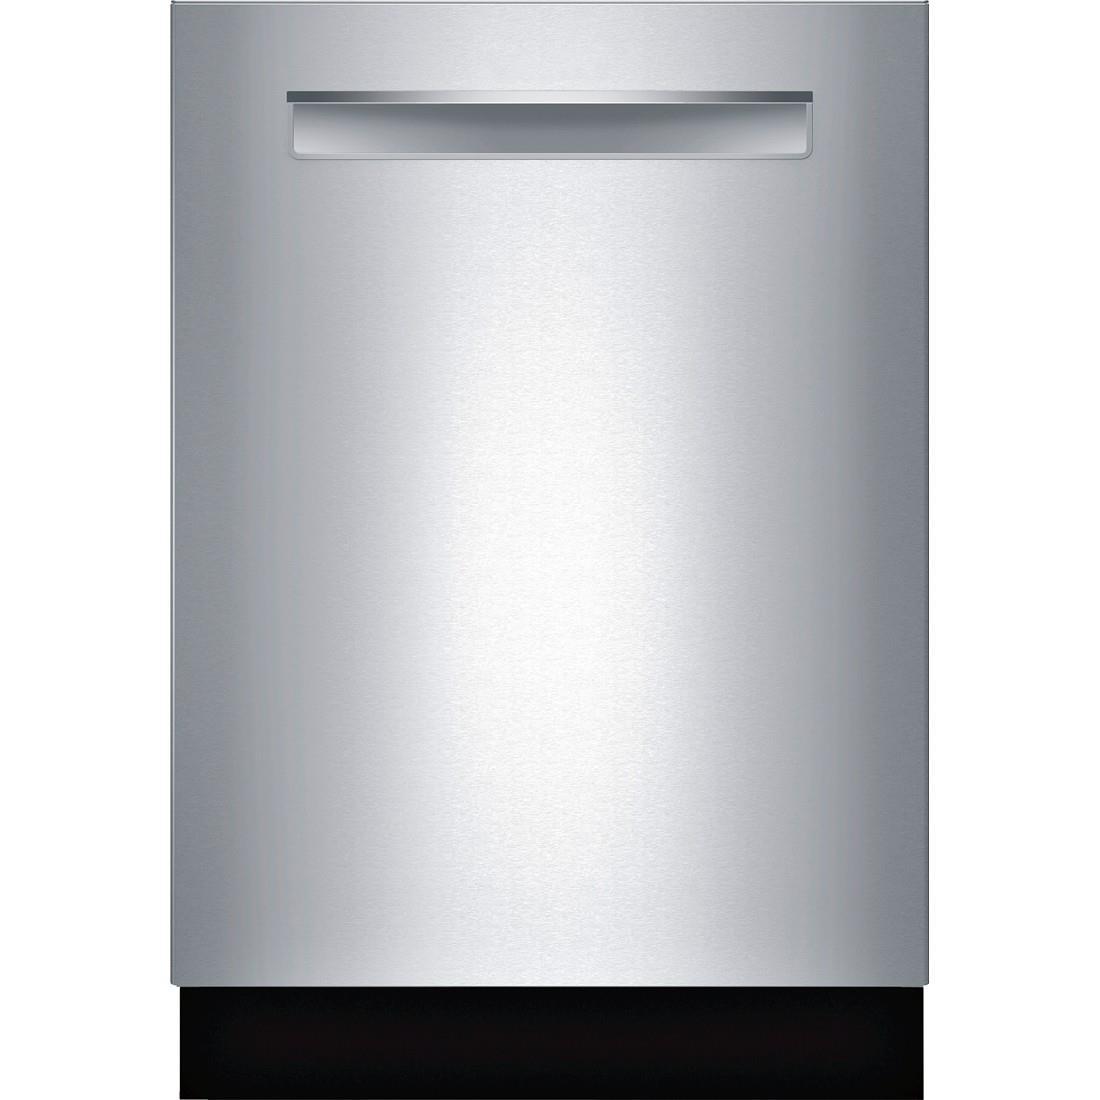 "Bosch Dishwashers 24"" Built-In Dishwasher - Item Number: SHP68T55UC"